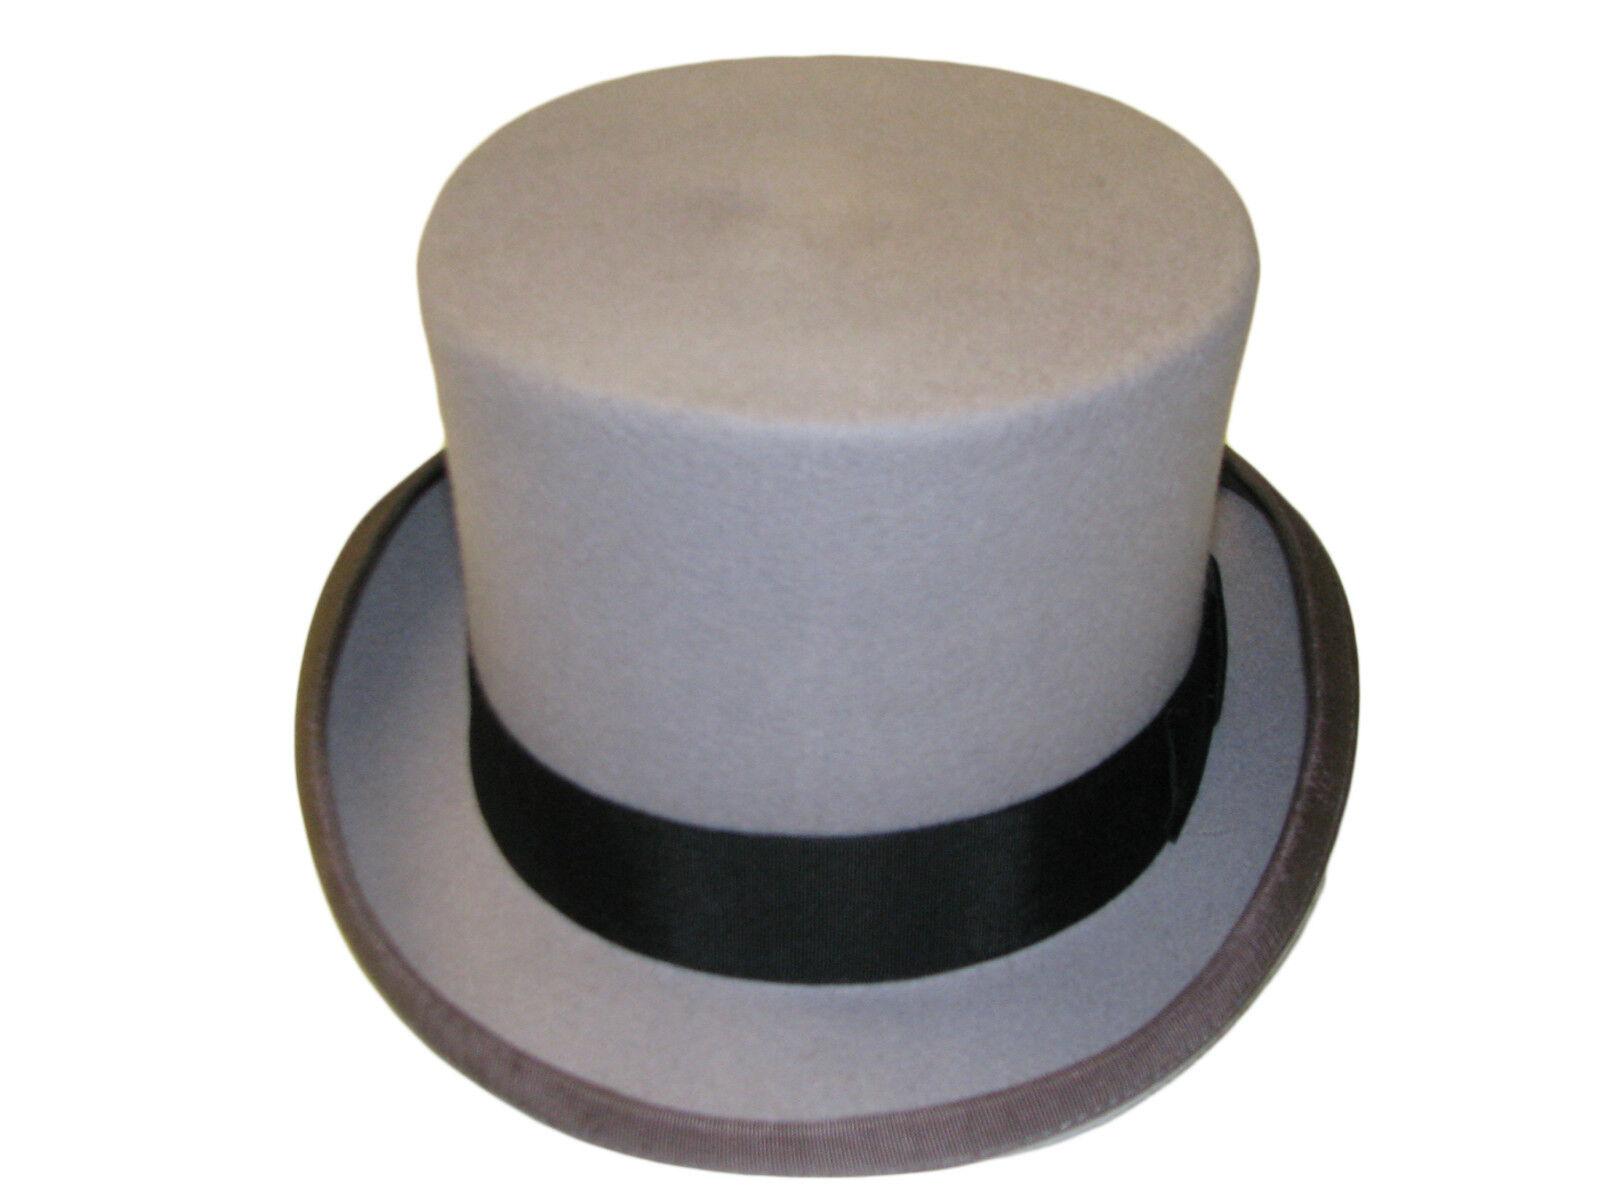 VIZ-UK WEAR Negro 100/% Lana Hecho a Mano 6/Alta Boda Event Sombrero de Copa by